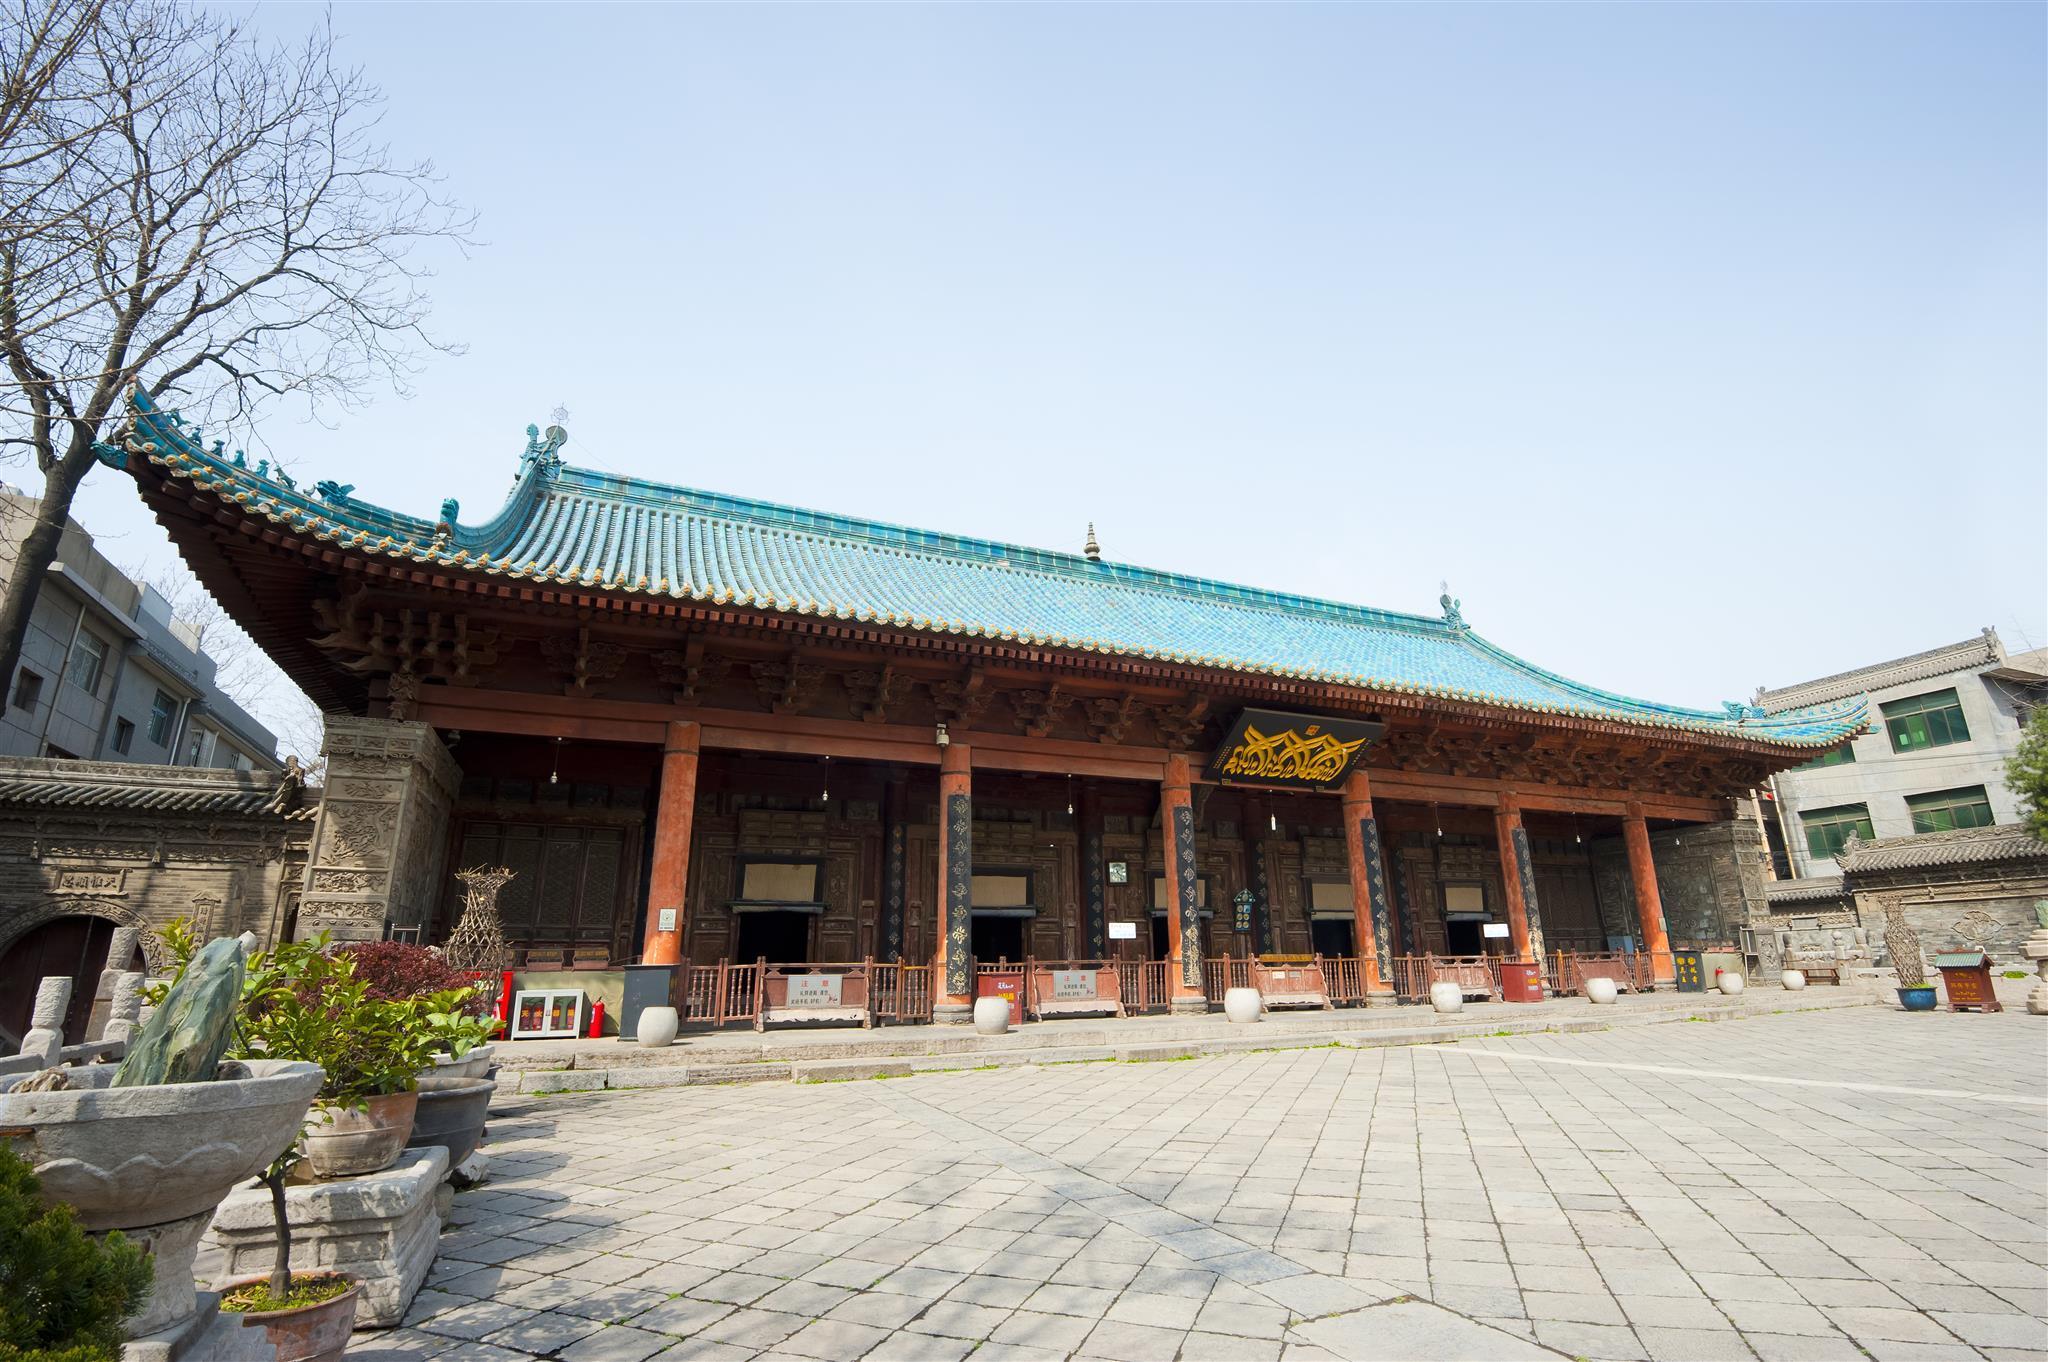 Super 8 Hotel Xi an Town Gods Temple-Cheng Huang M, Xi'an